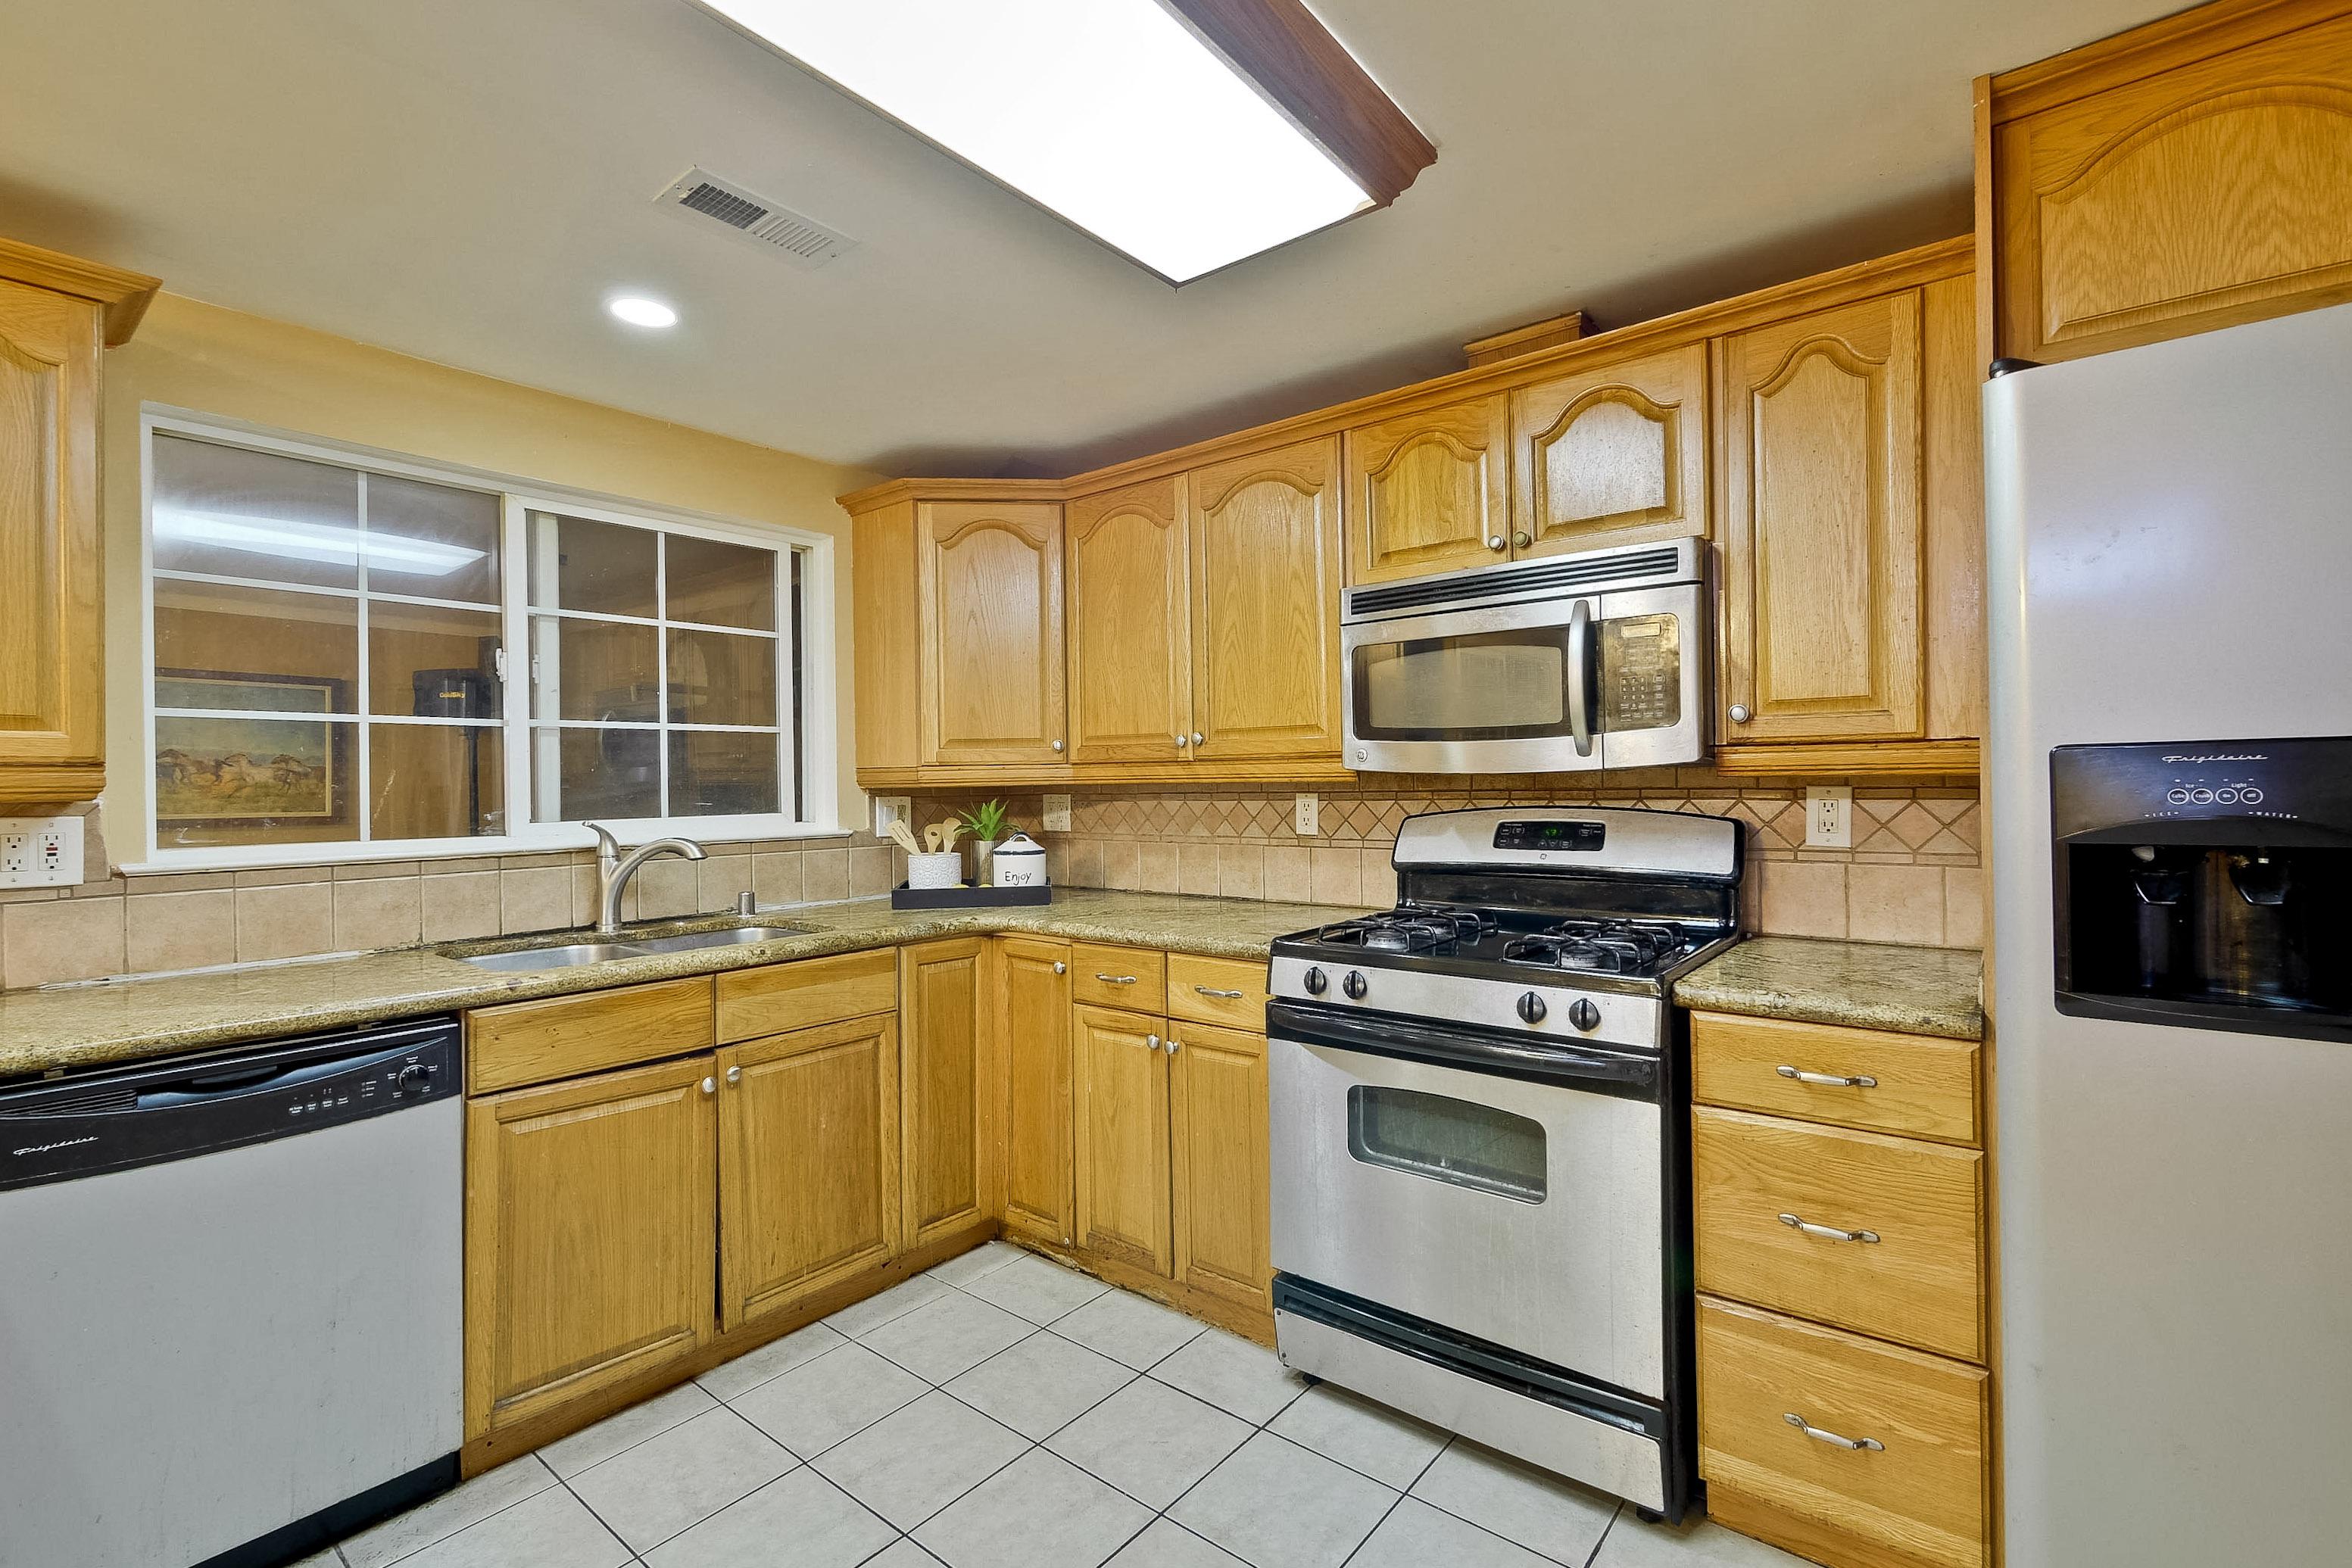 315 Meadowlake Dr, Sunnyvale 94089 - Kitchen (B)